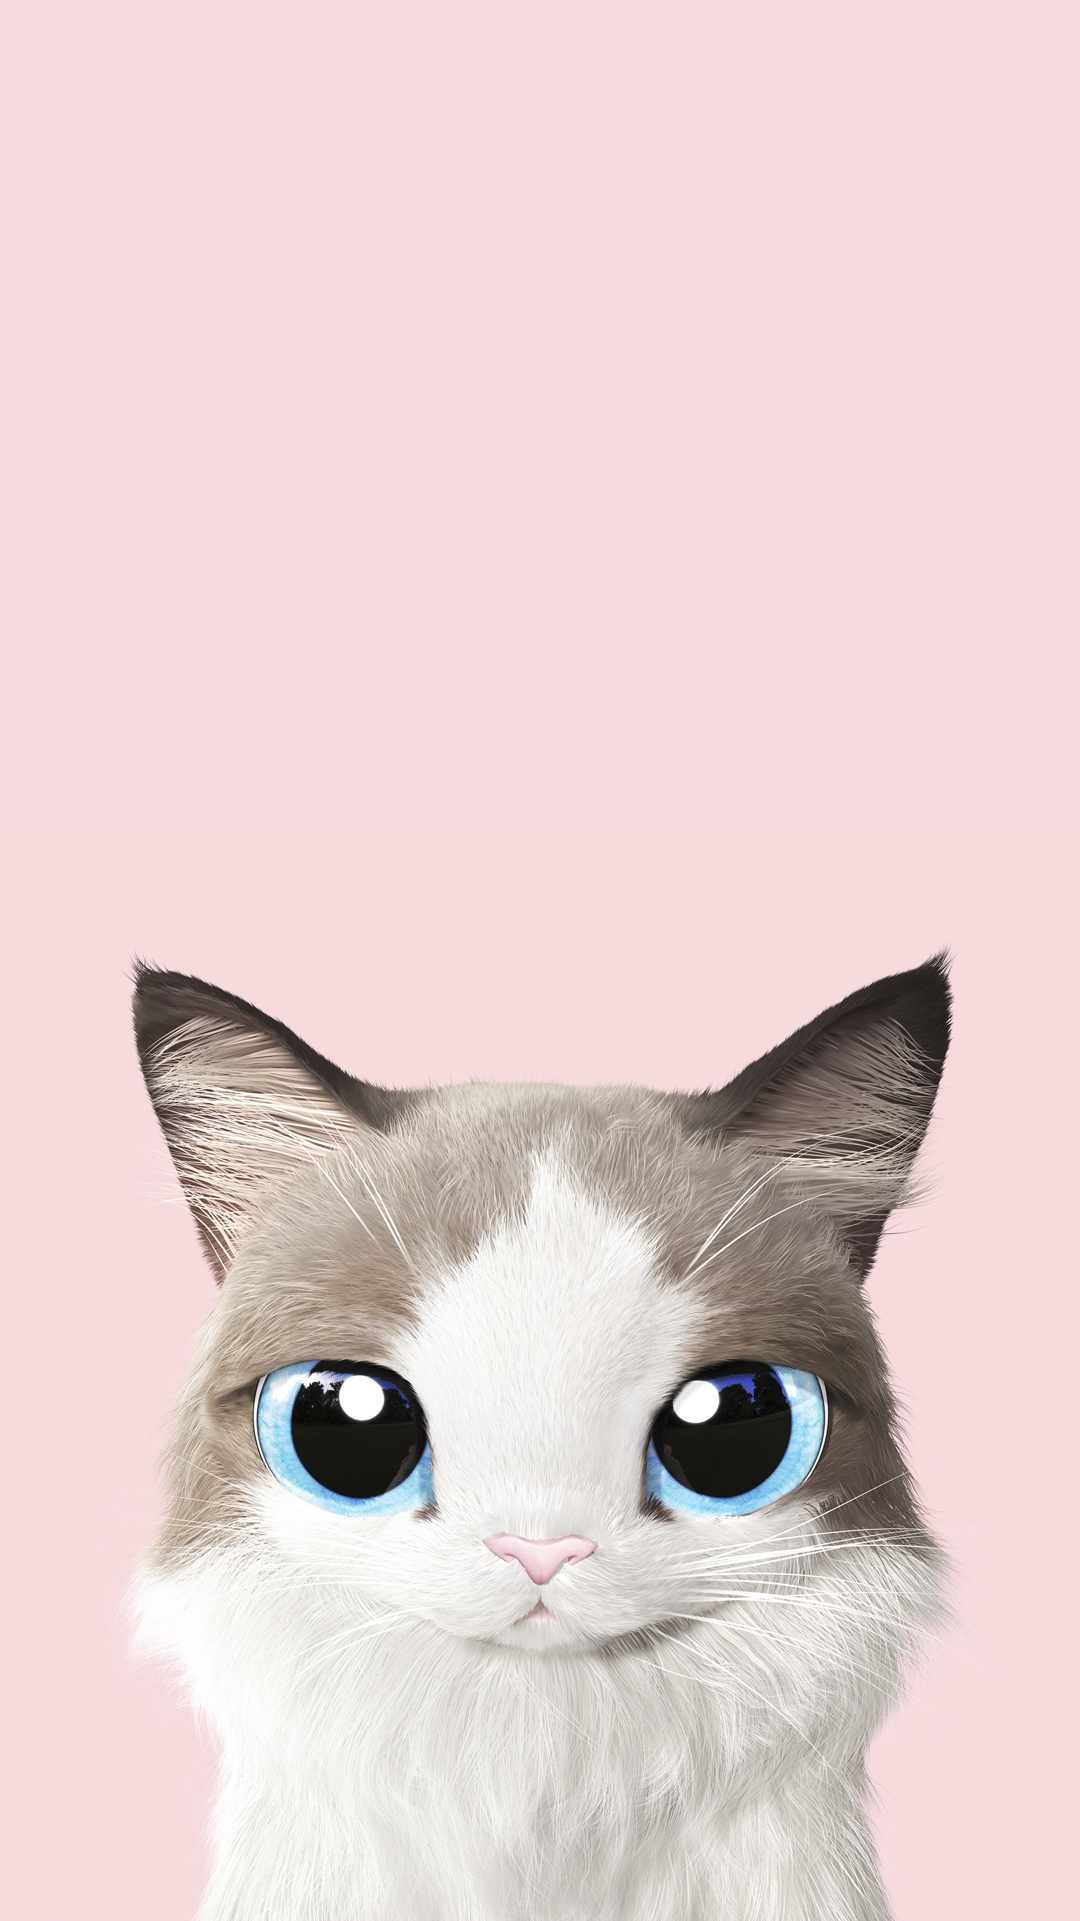 Обои на телефон котята красивые (9)